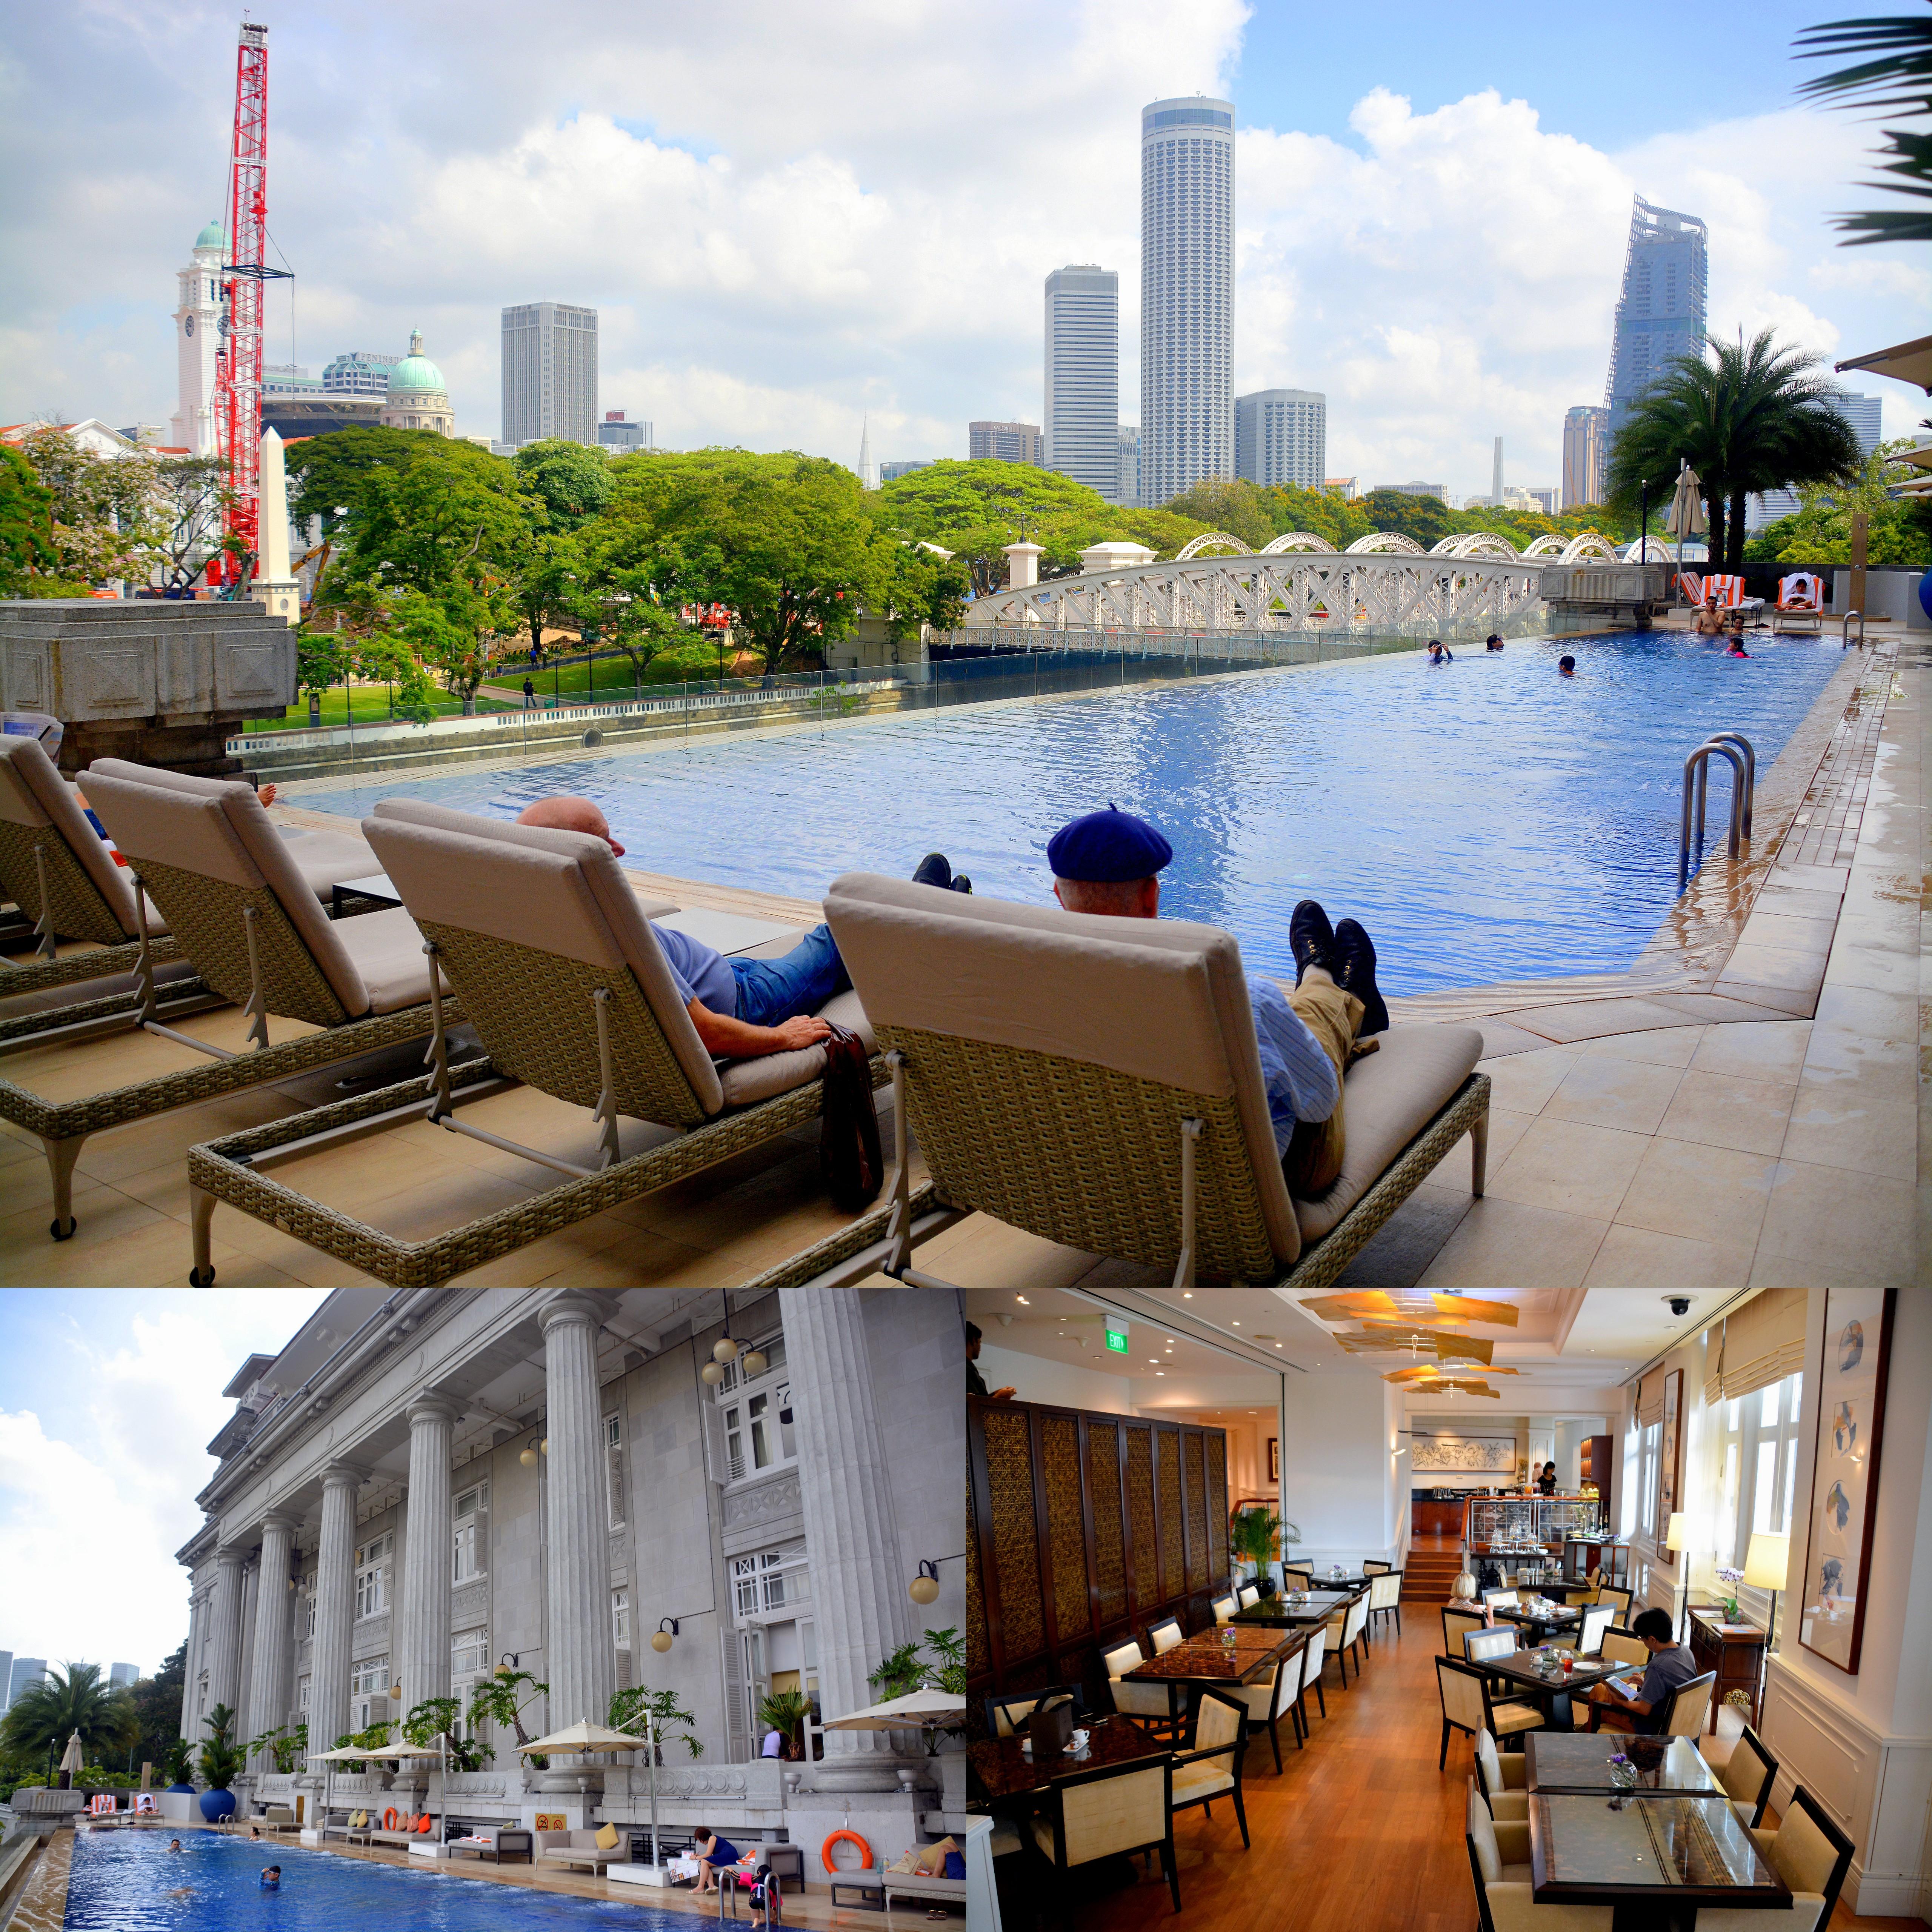 Fullerton Hotel Review Ed Parenting Lifestyle Travel Blog